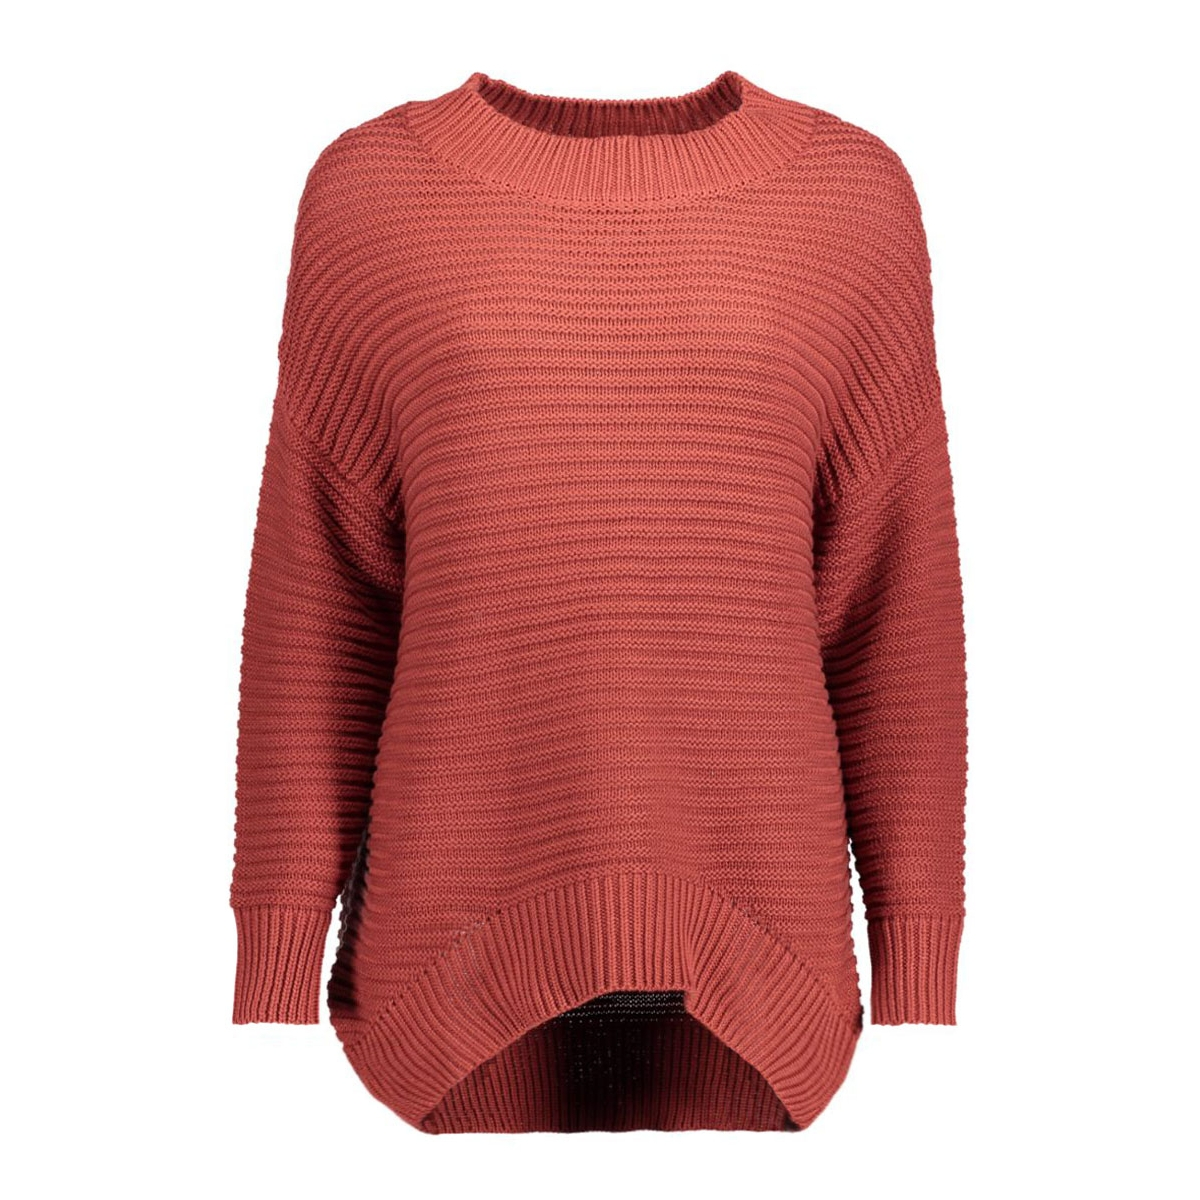 objmaries l/s knit pullover .i 87 23023170 object trui rosewood